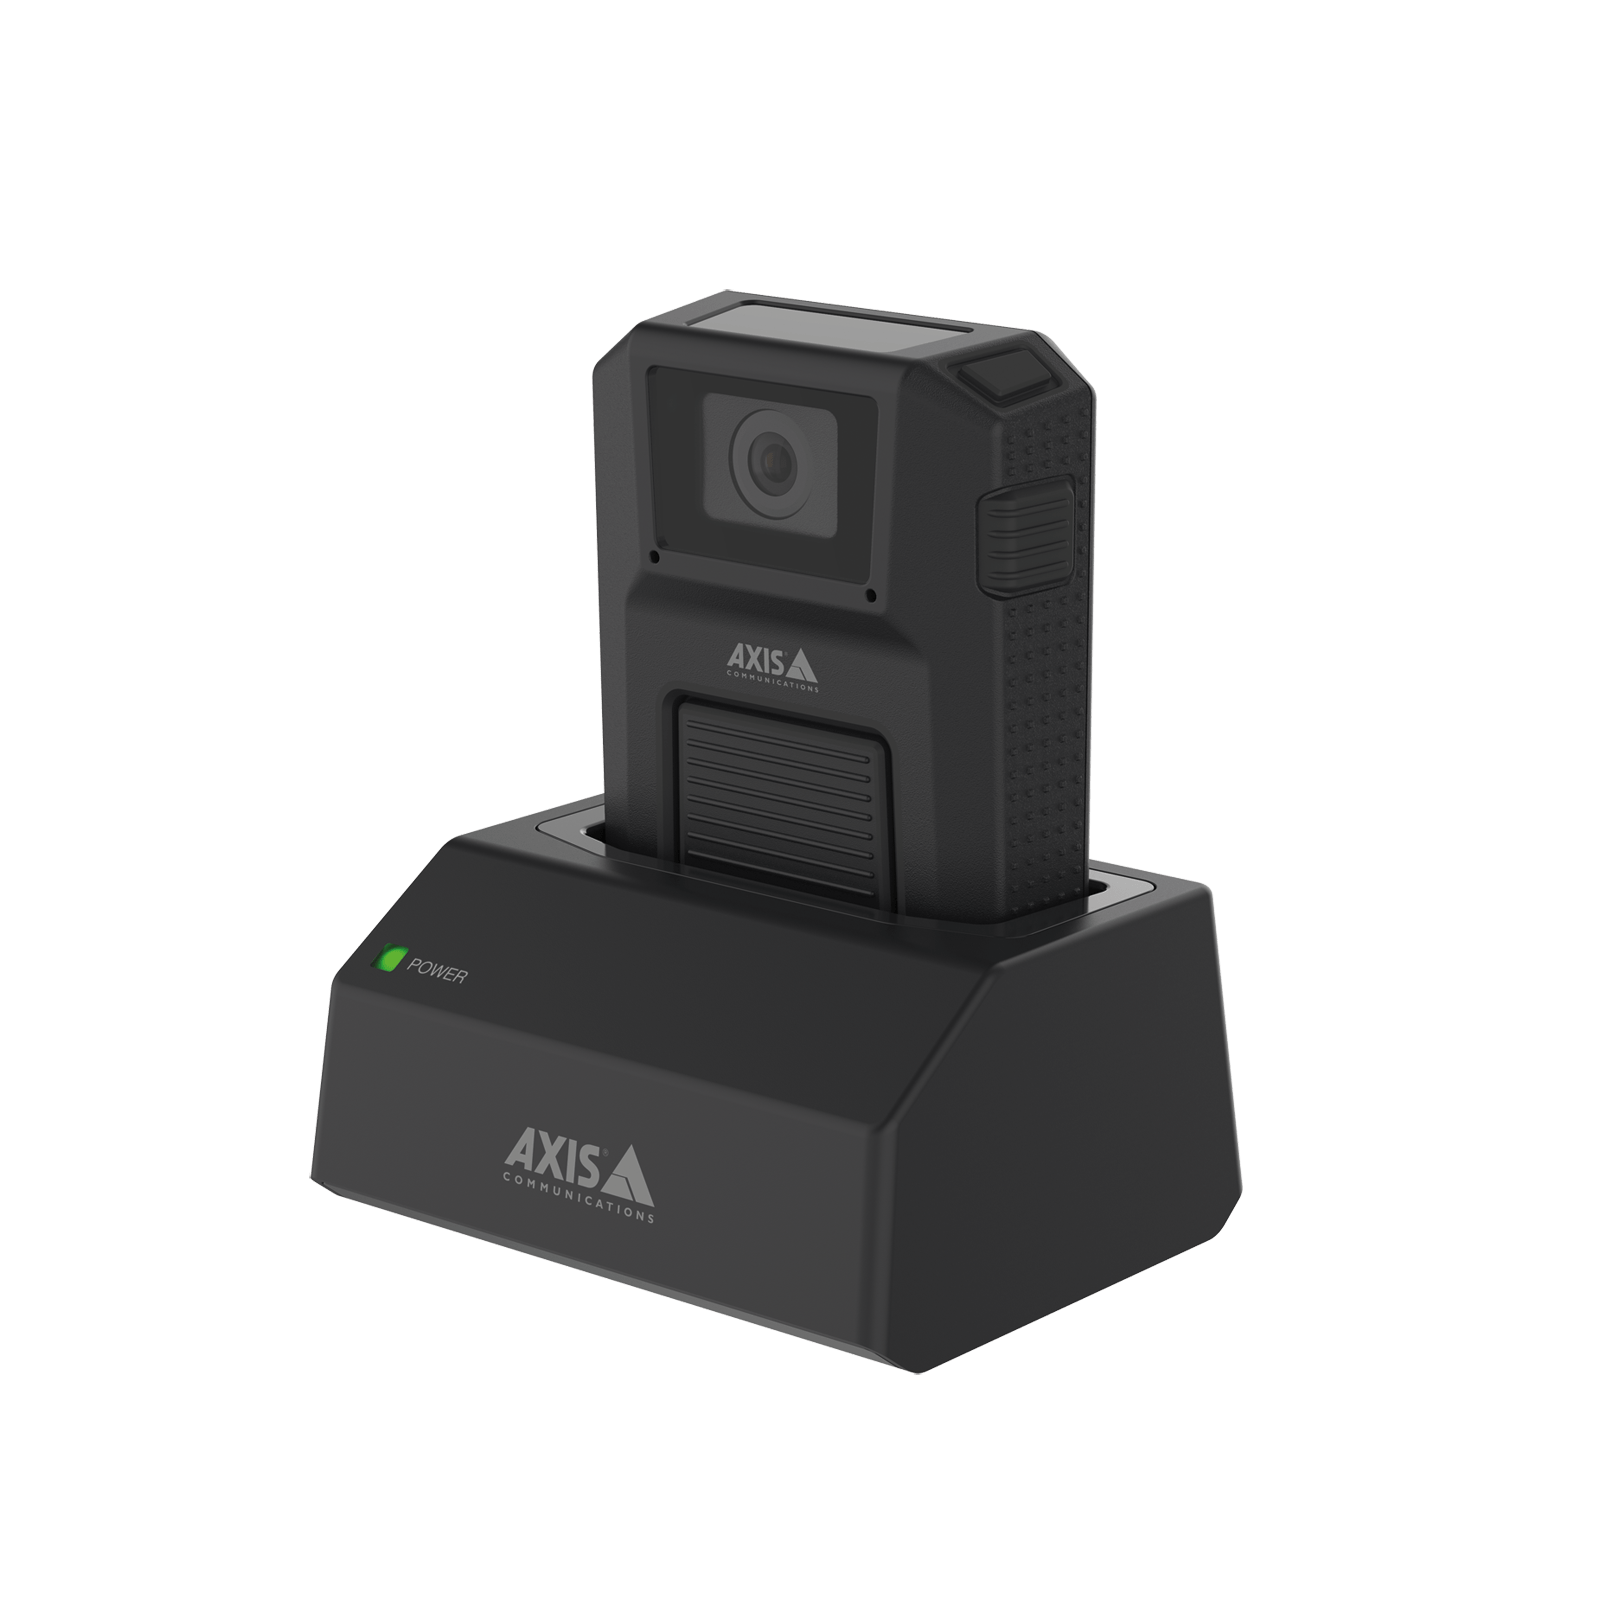 AXIS W100 Body Worn Camera